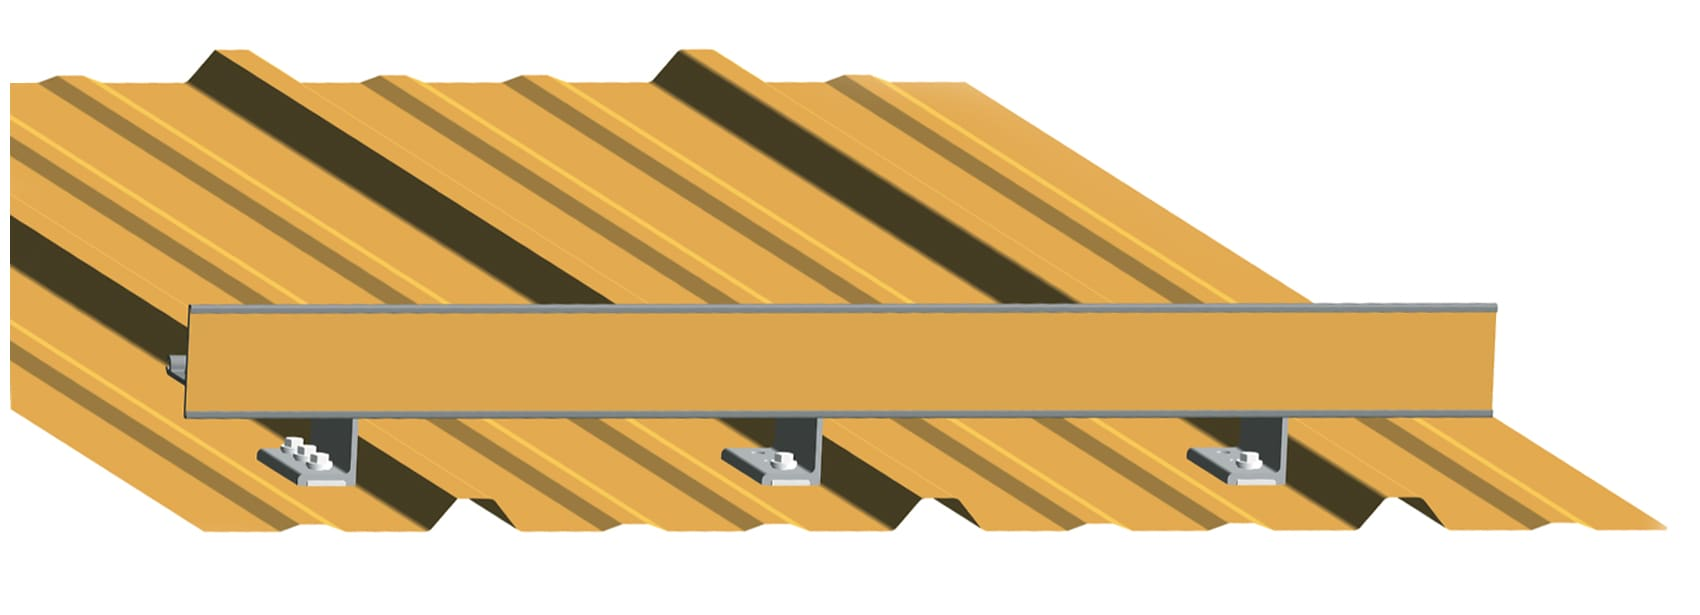 Exposed fastened VersaBracket with ColorGard - All American Steel